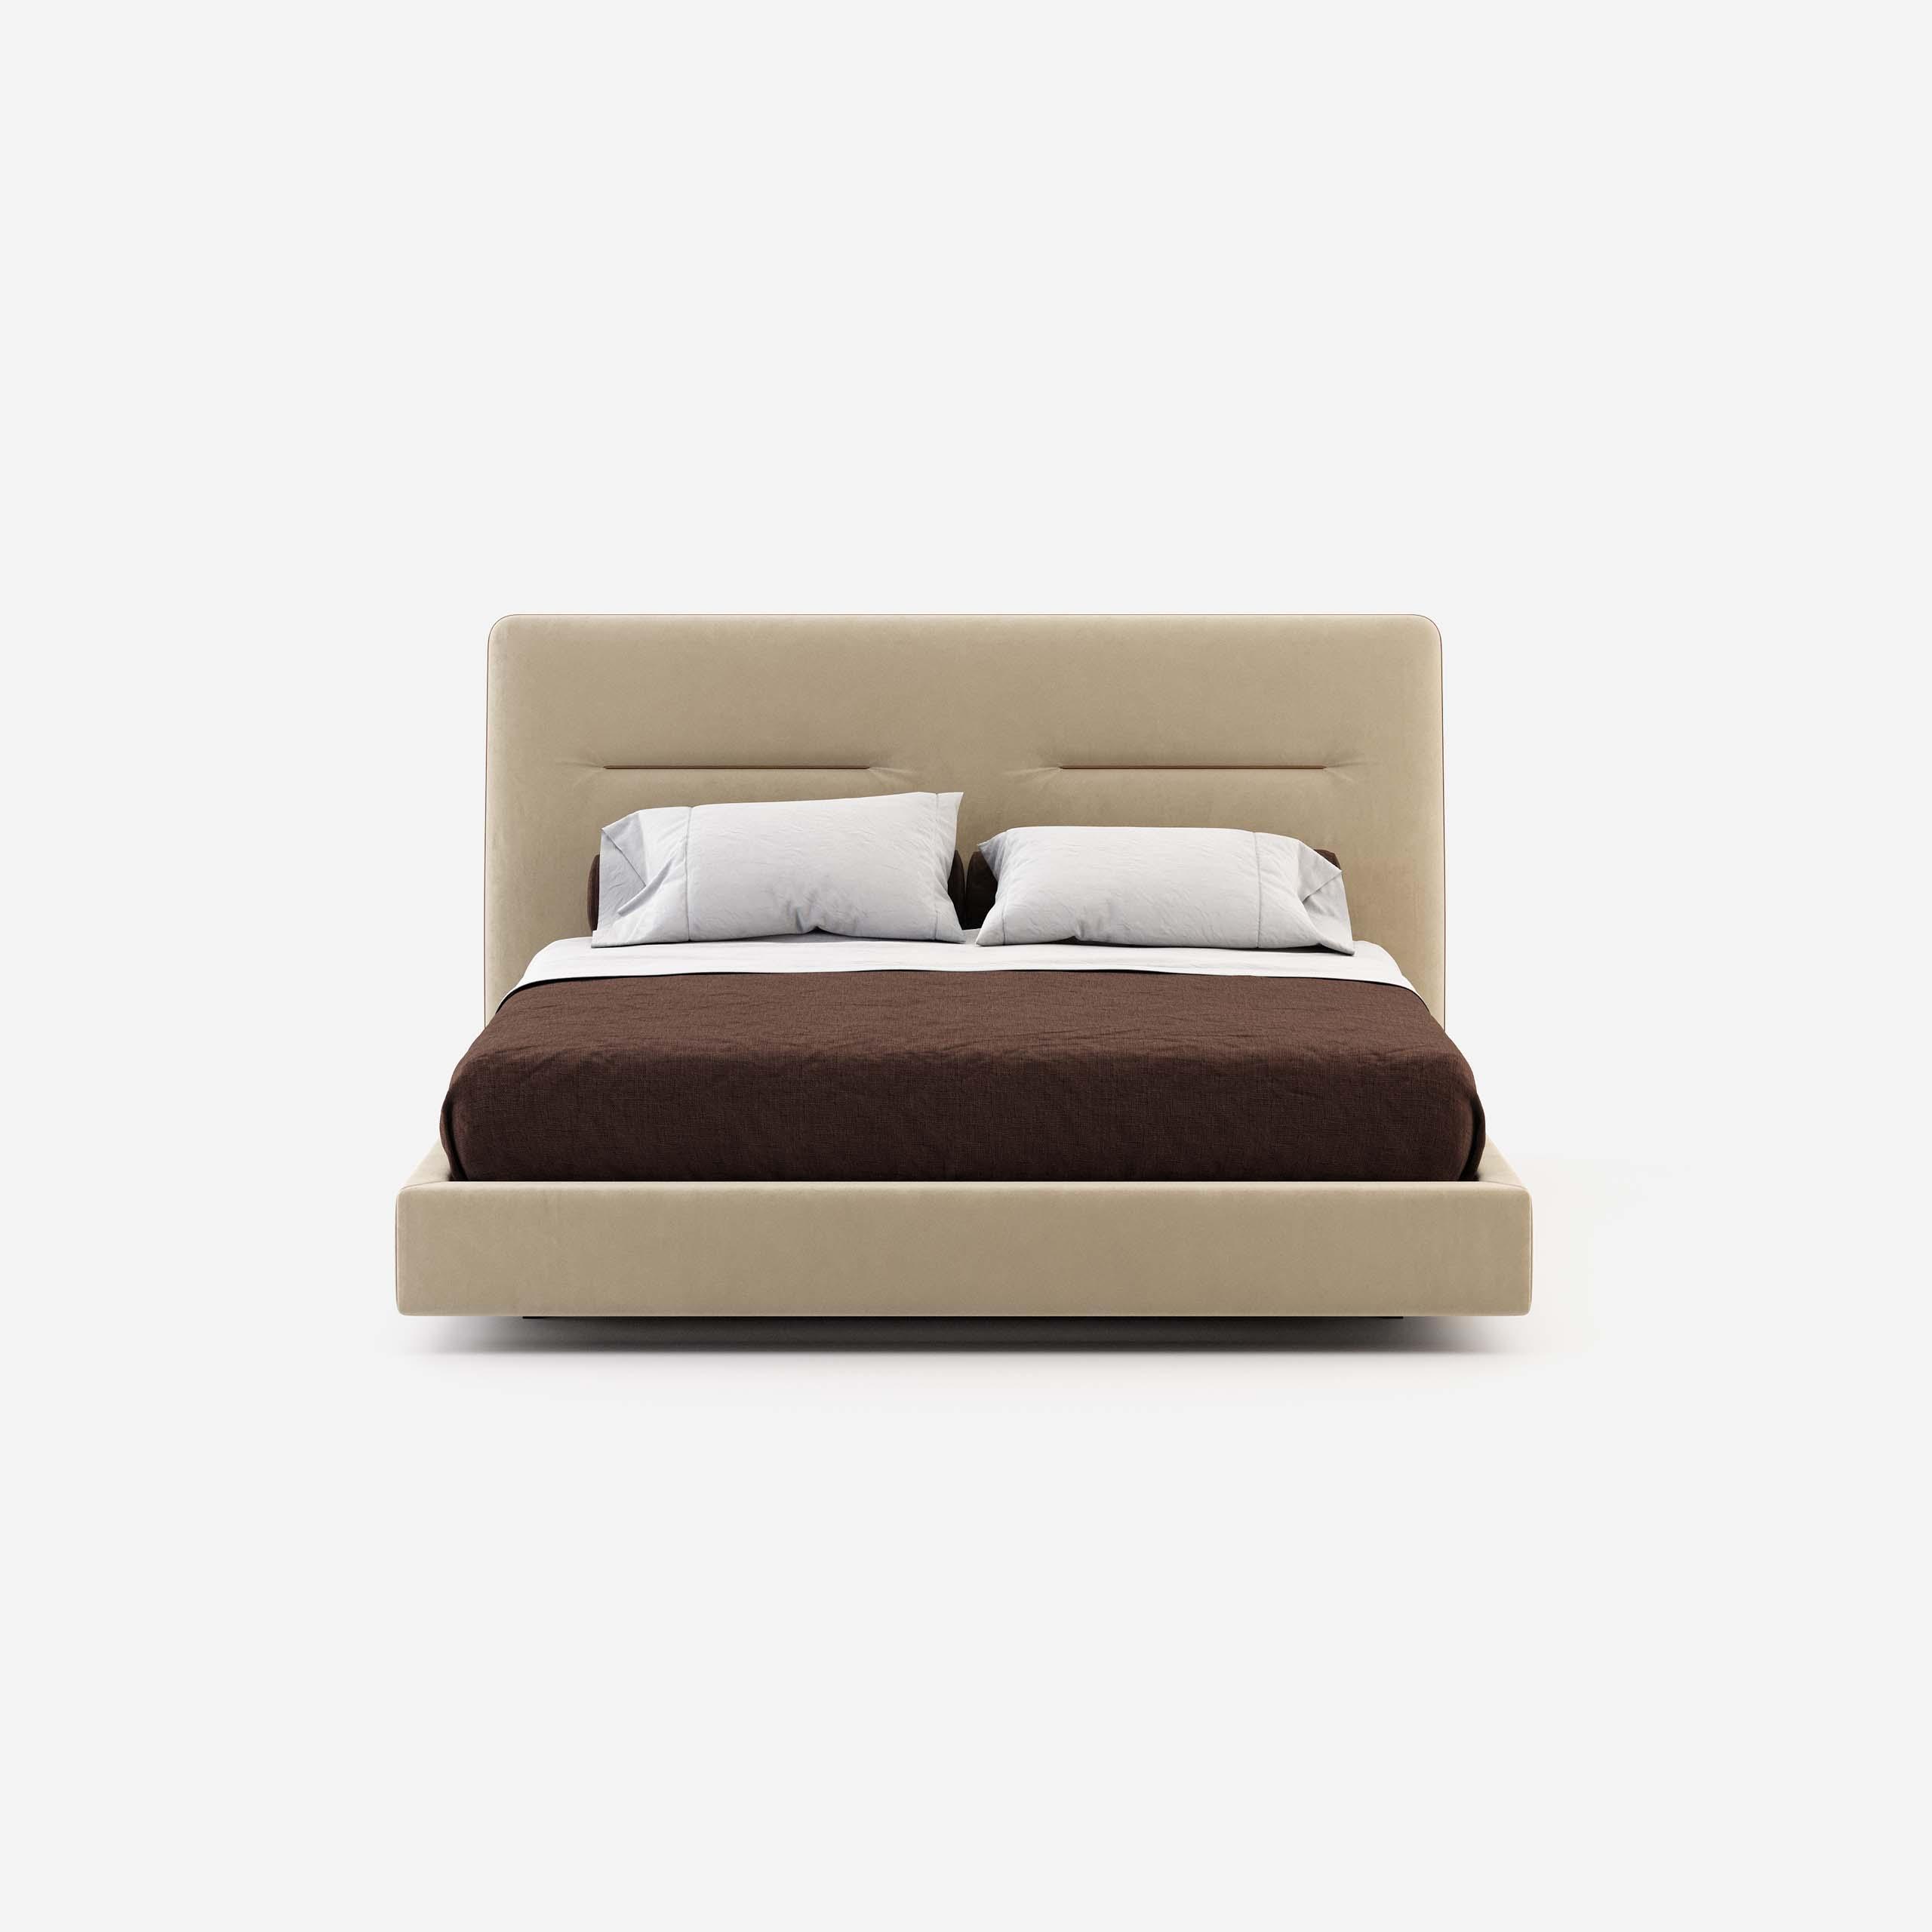 helen-bed-domkapa-new-collection-2021-bedroom-decor (2)